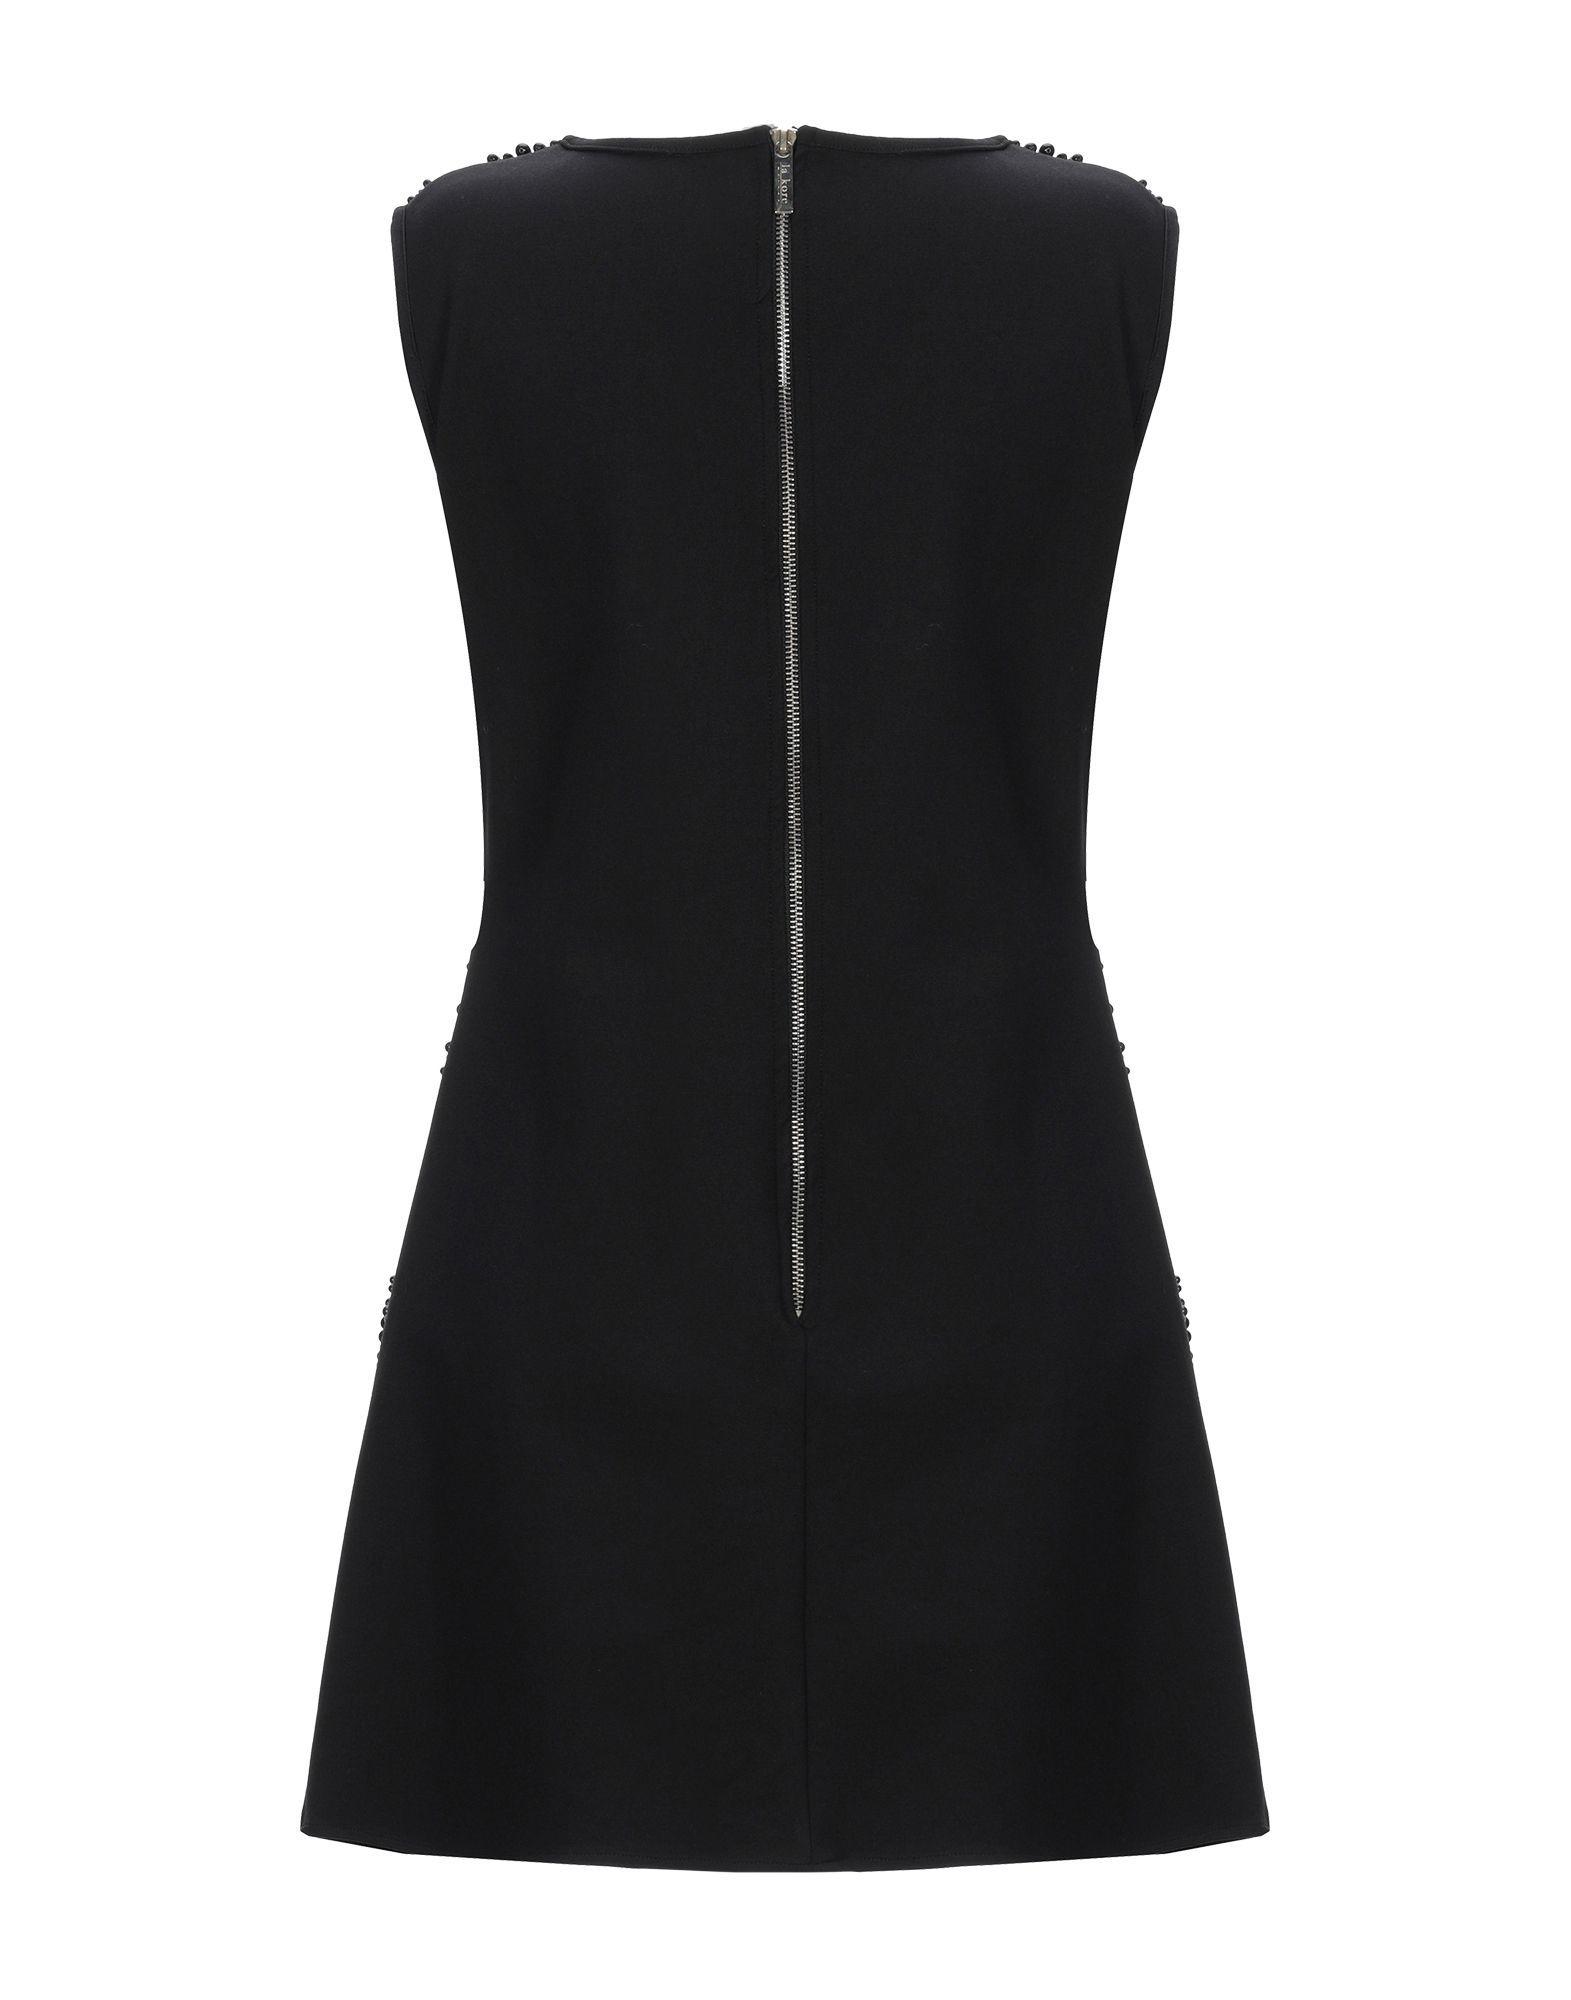 La Kore Black Sleeveless Dress